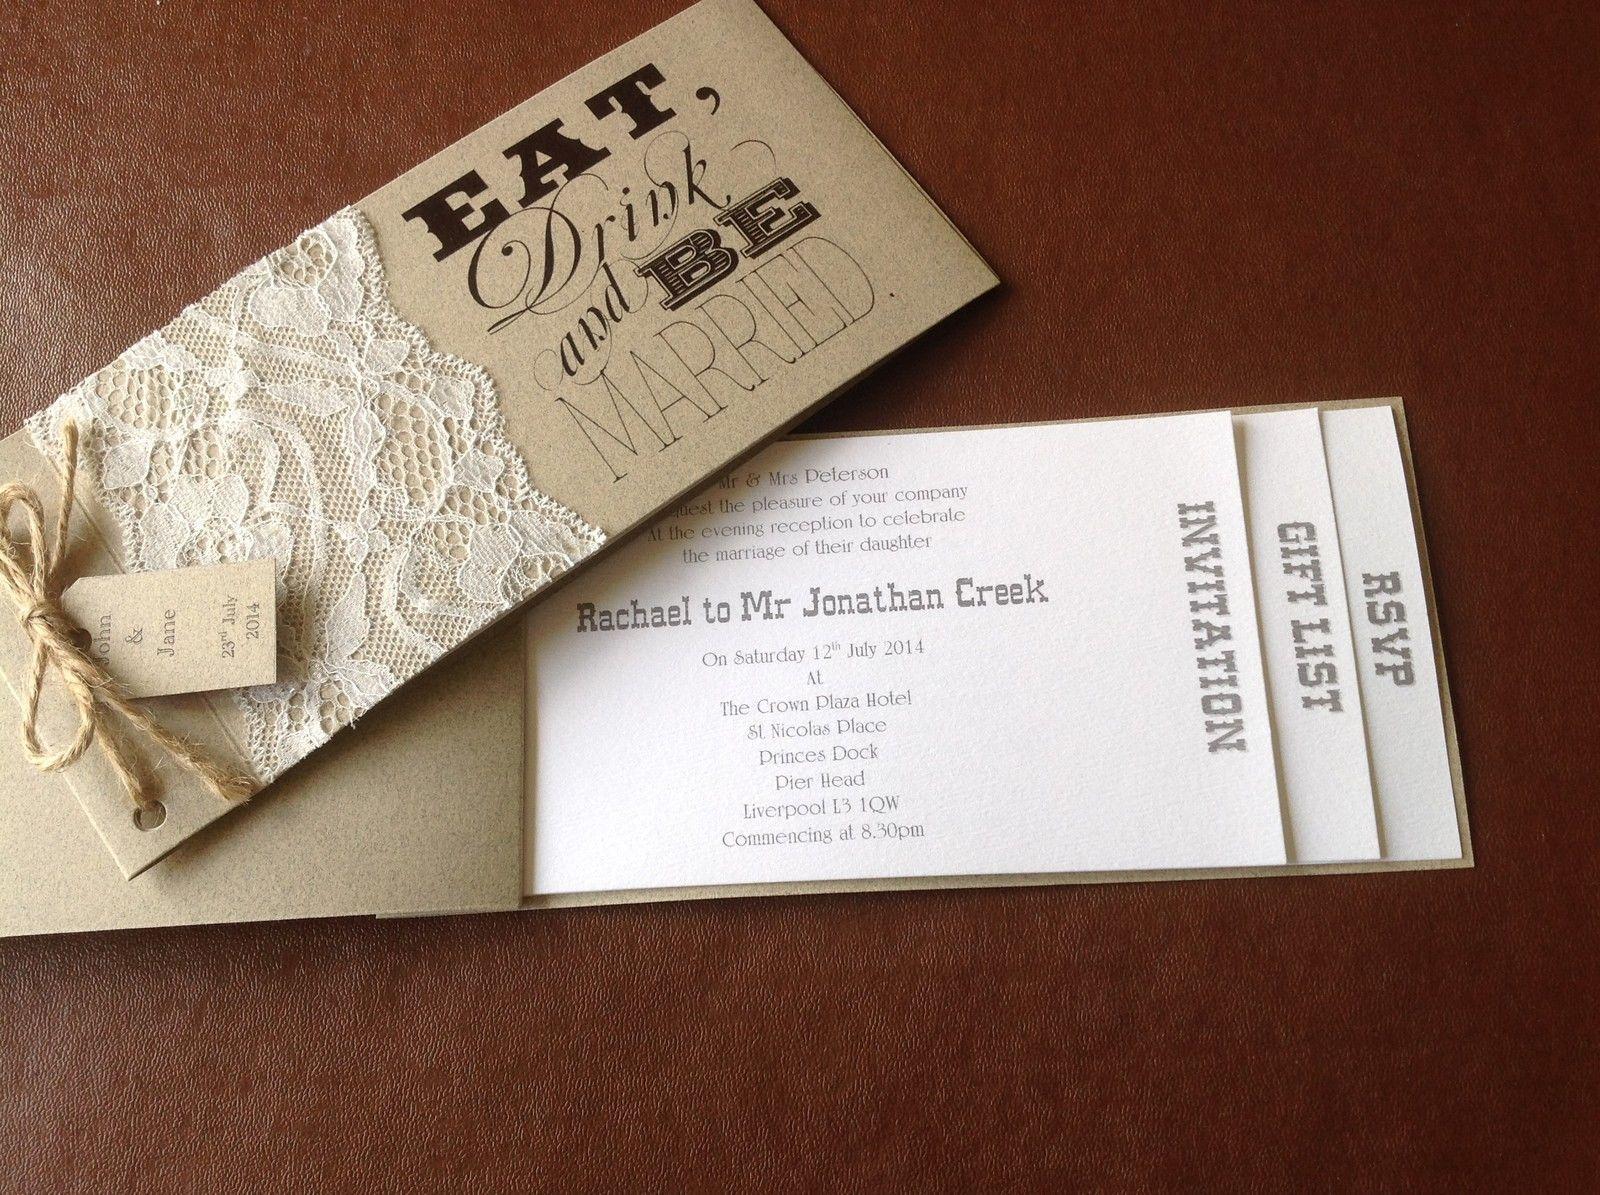 Shabby chic cheque book wedding invitation | Cheque book wedding ...